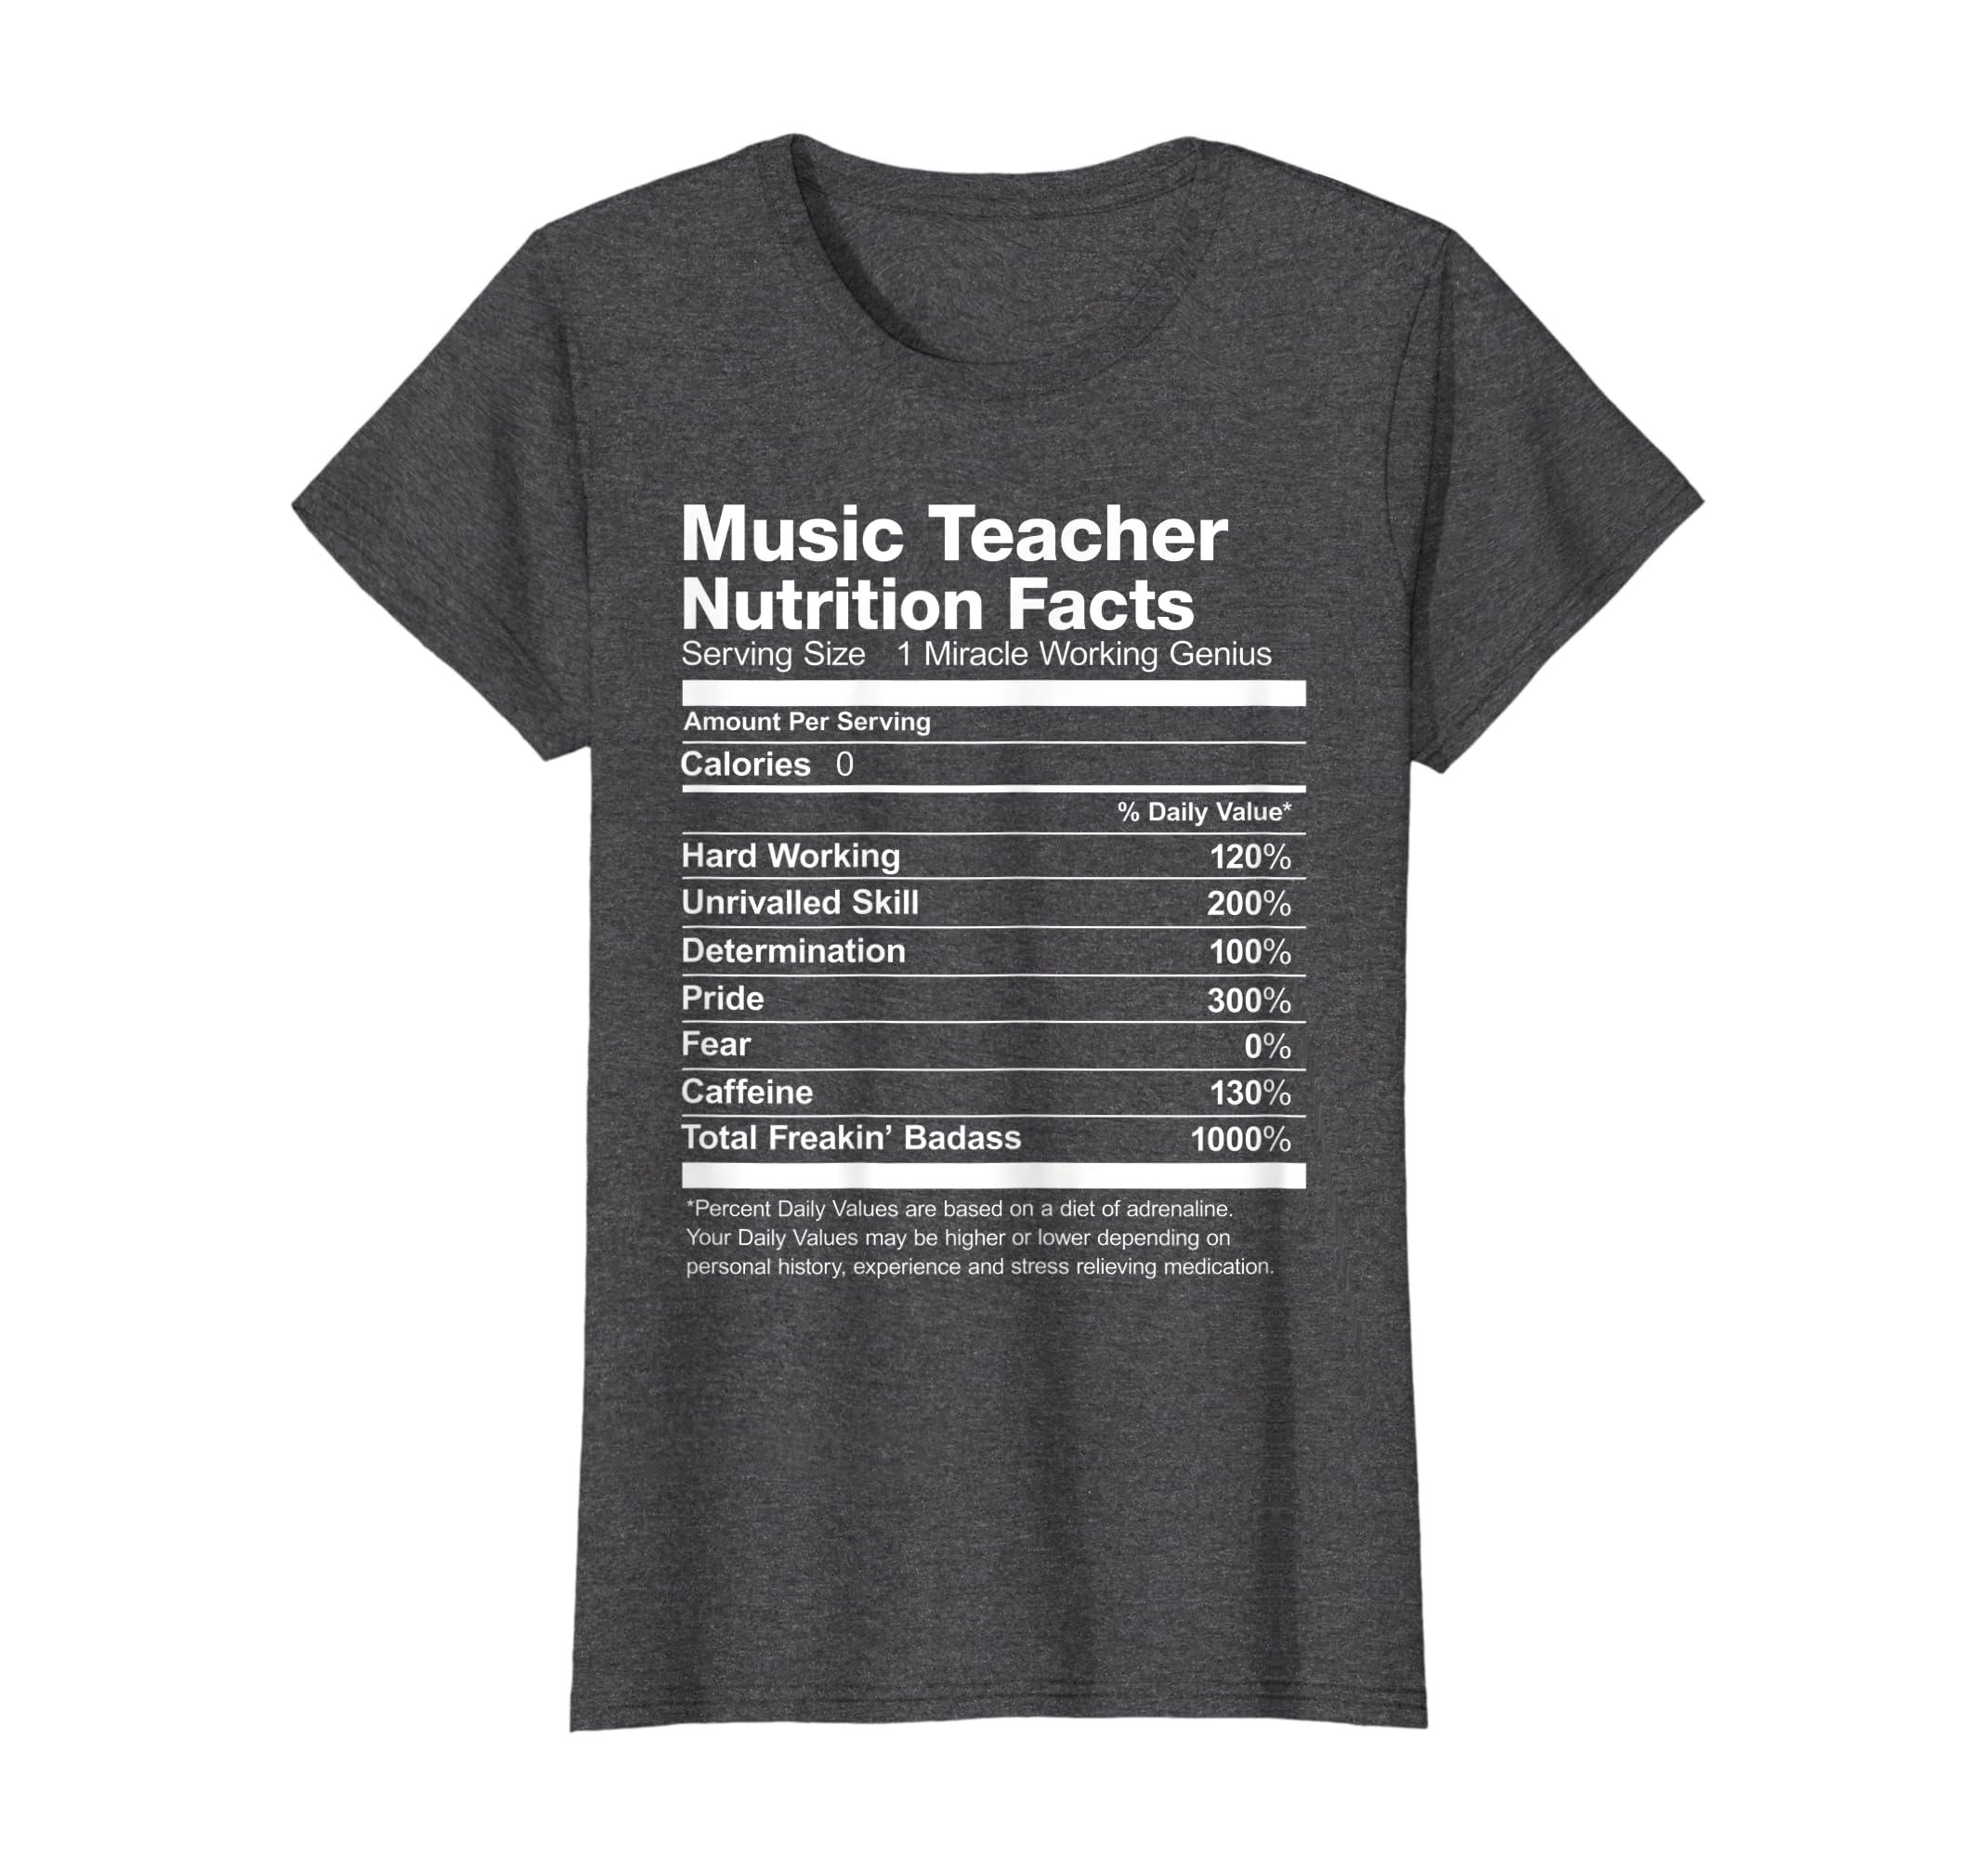 5cbb2316 Amazon.com: Music Teacher Nutrition Facts Funny T-Shirt: Clothing